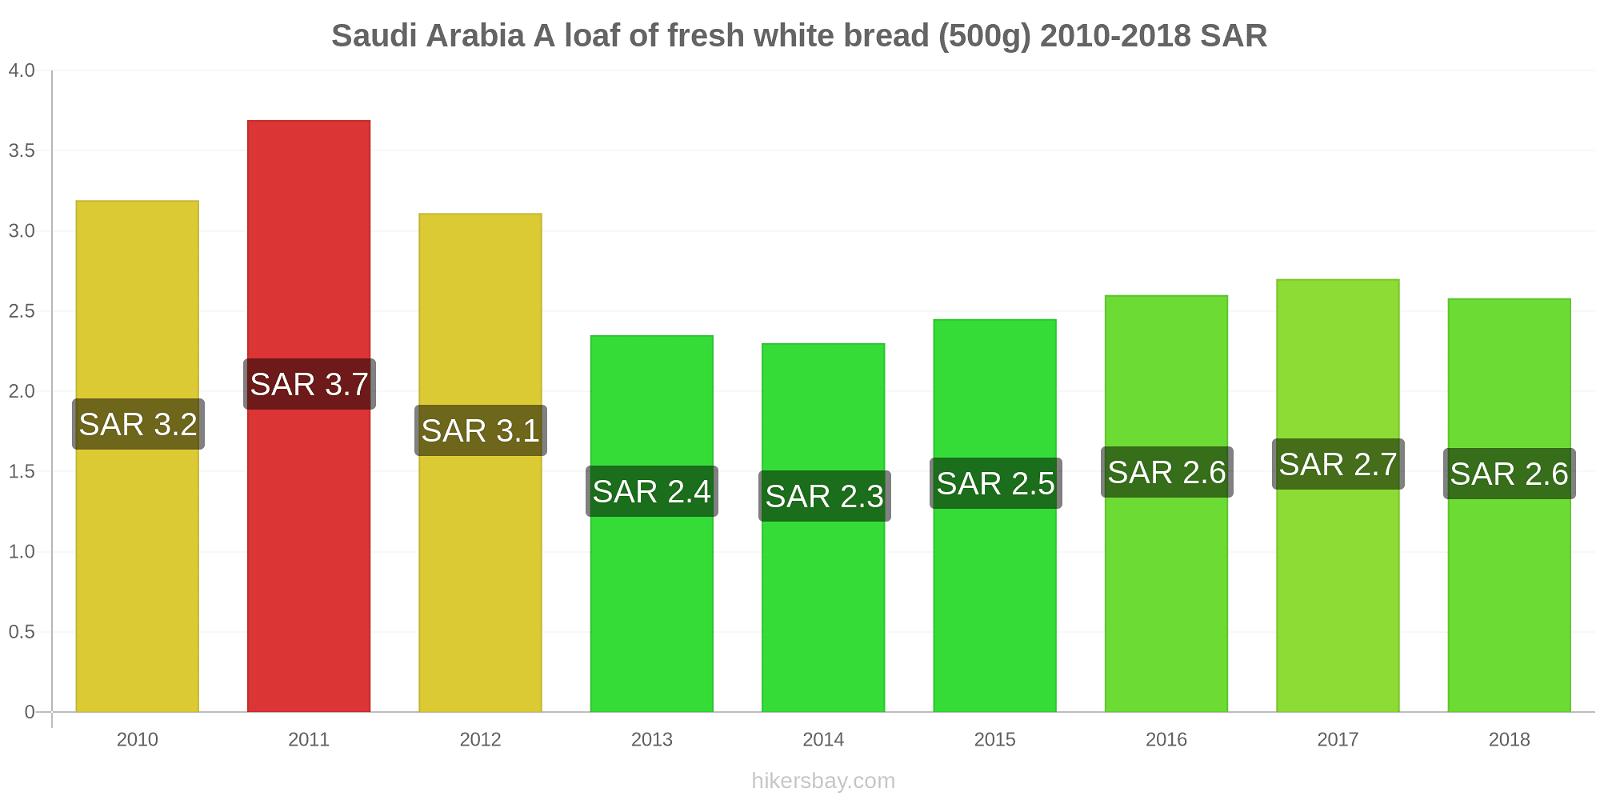 Saudi Arabia price changes A loaf of fresh white bread (500g) hikersbay.com